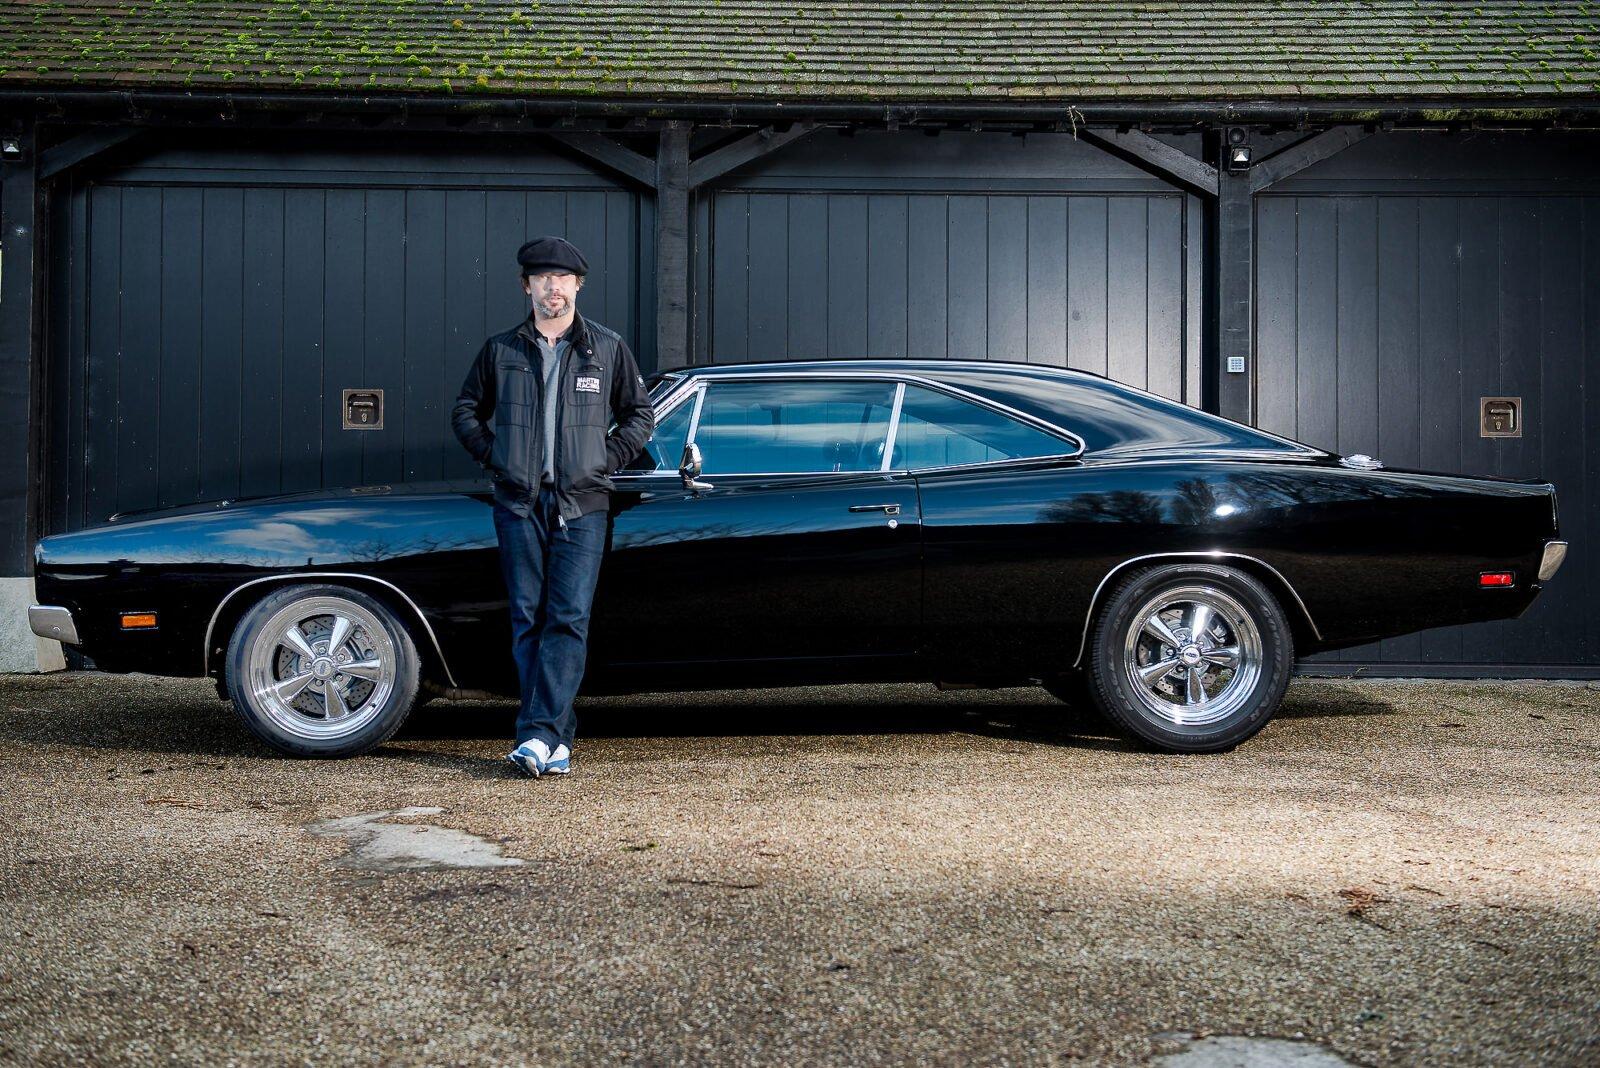 Dodge Charger Bullitt Jay Kay Jamiroquai 1600x1068 - Ex-Bruce Willis + Ex-Jay Kay 1969 Bullitt-Spec Dodge Charger